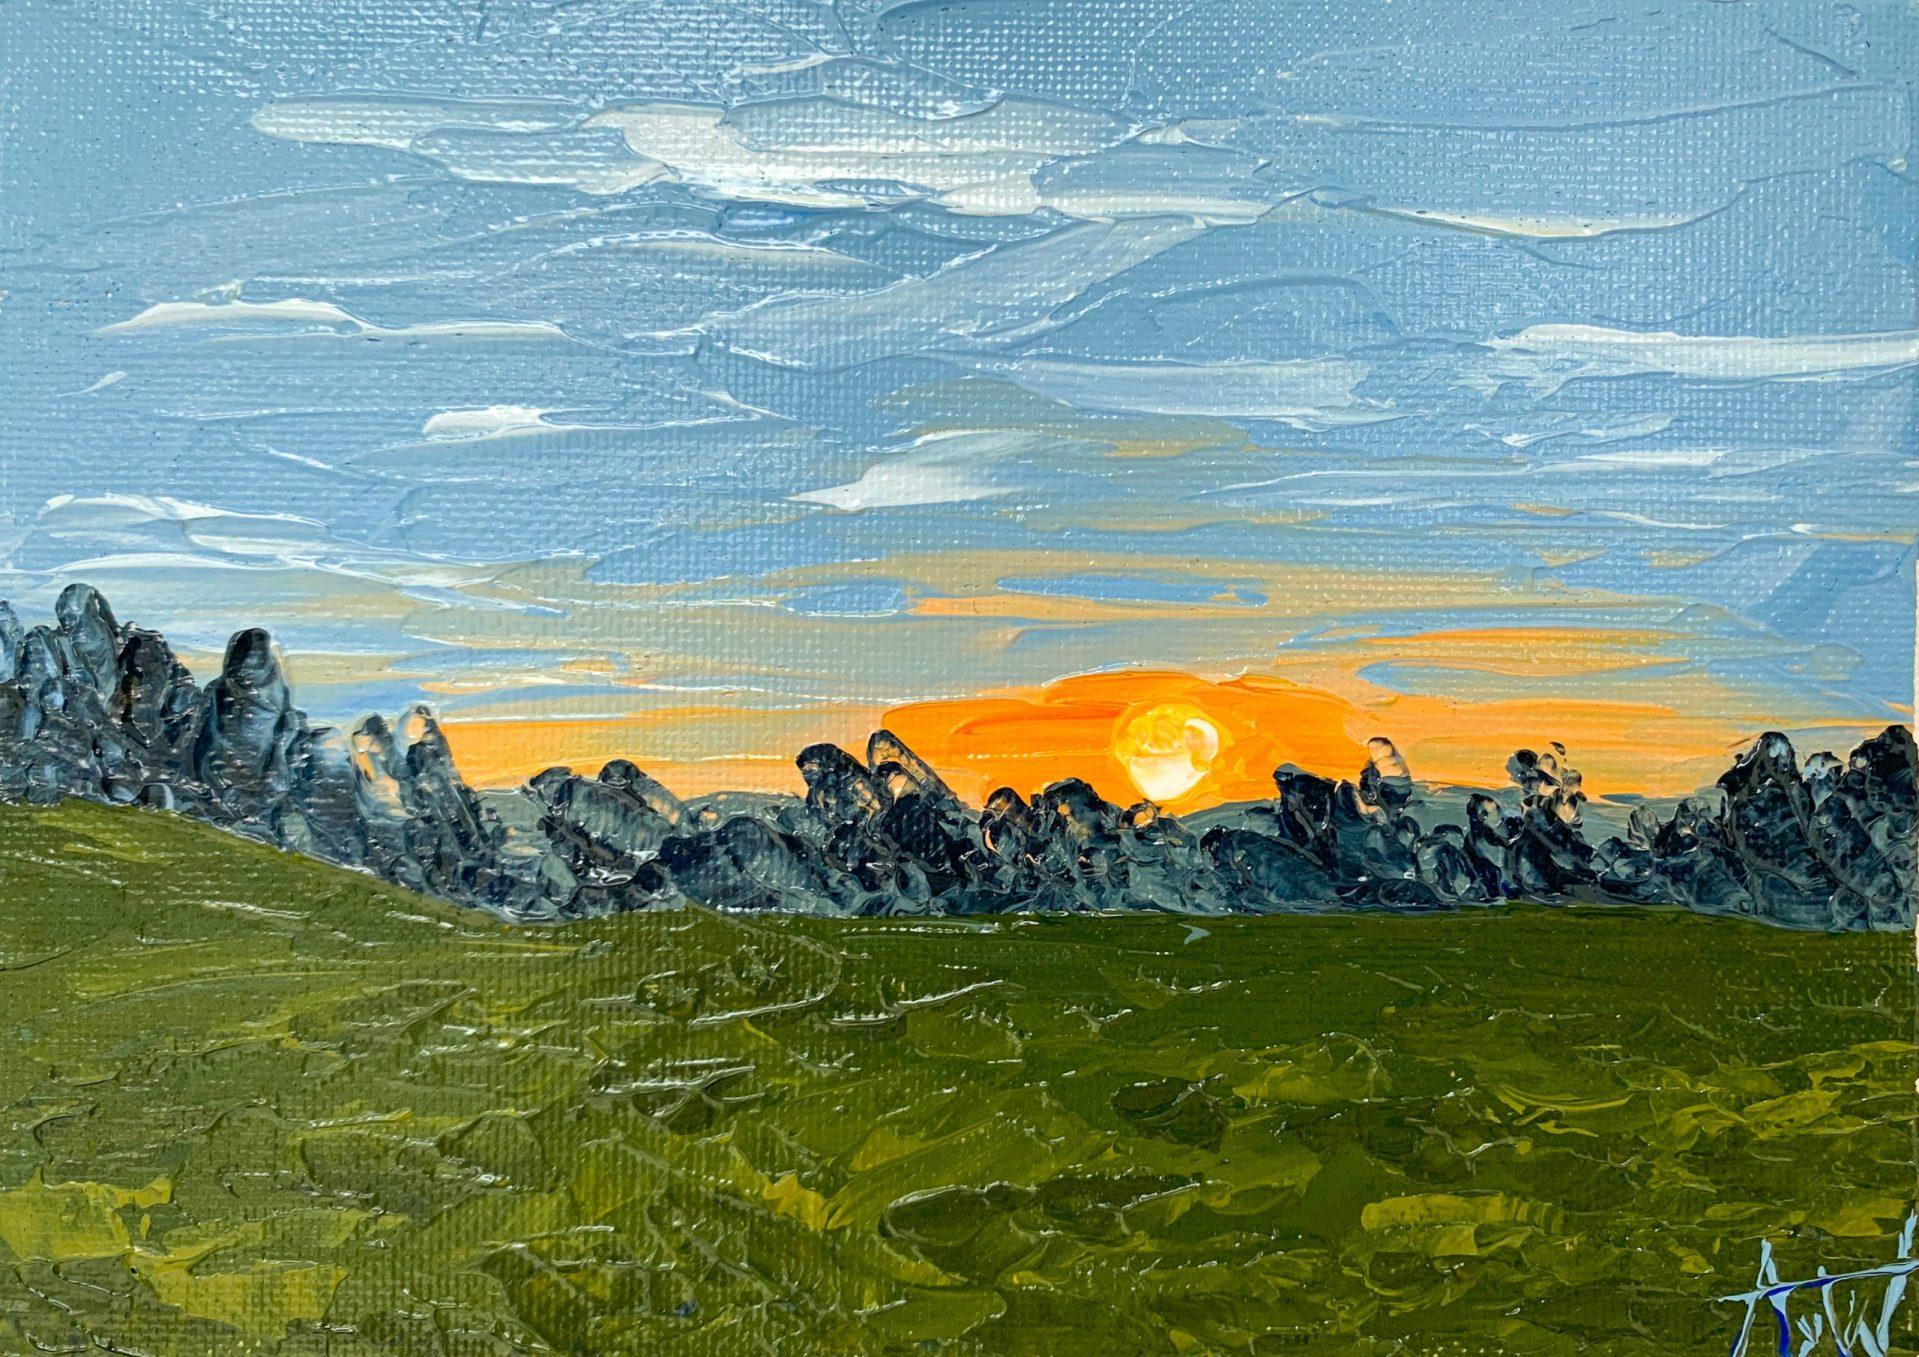 the sun is setting, golden sunset, spring landscape